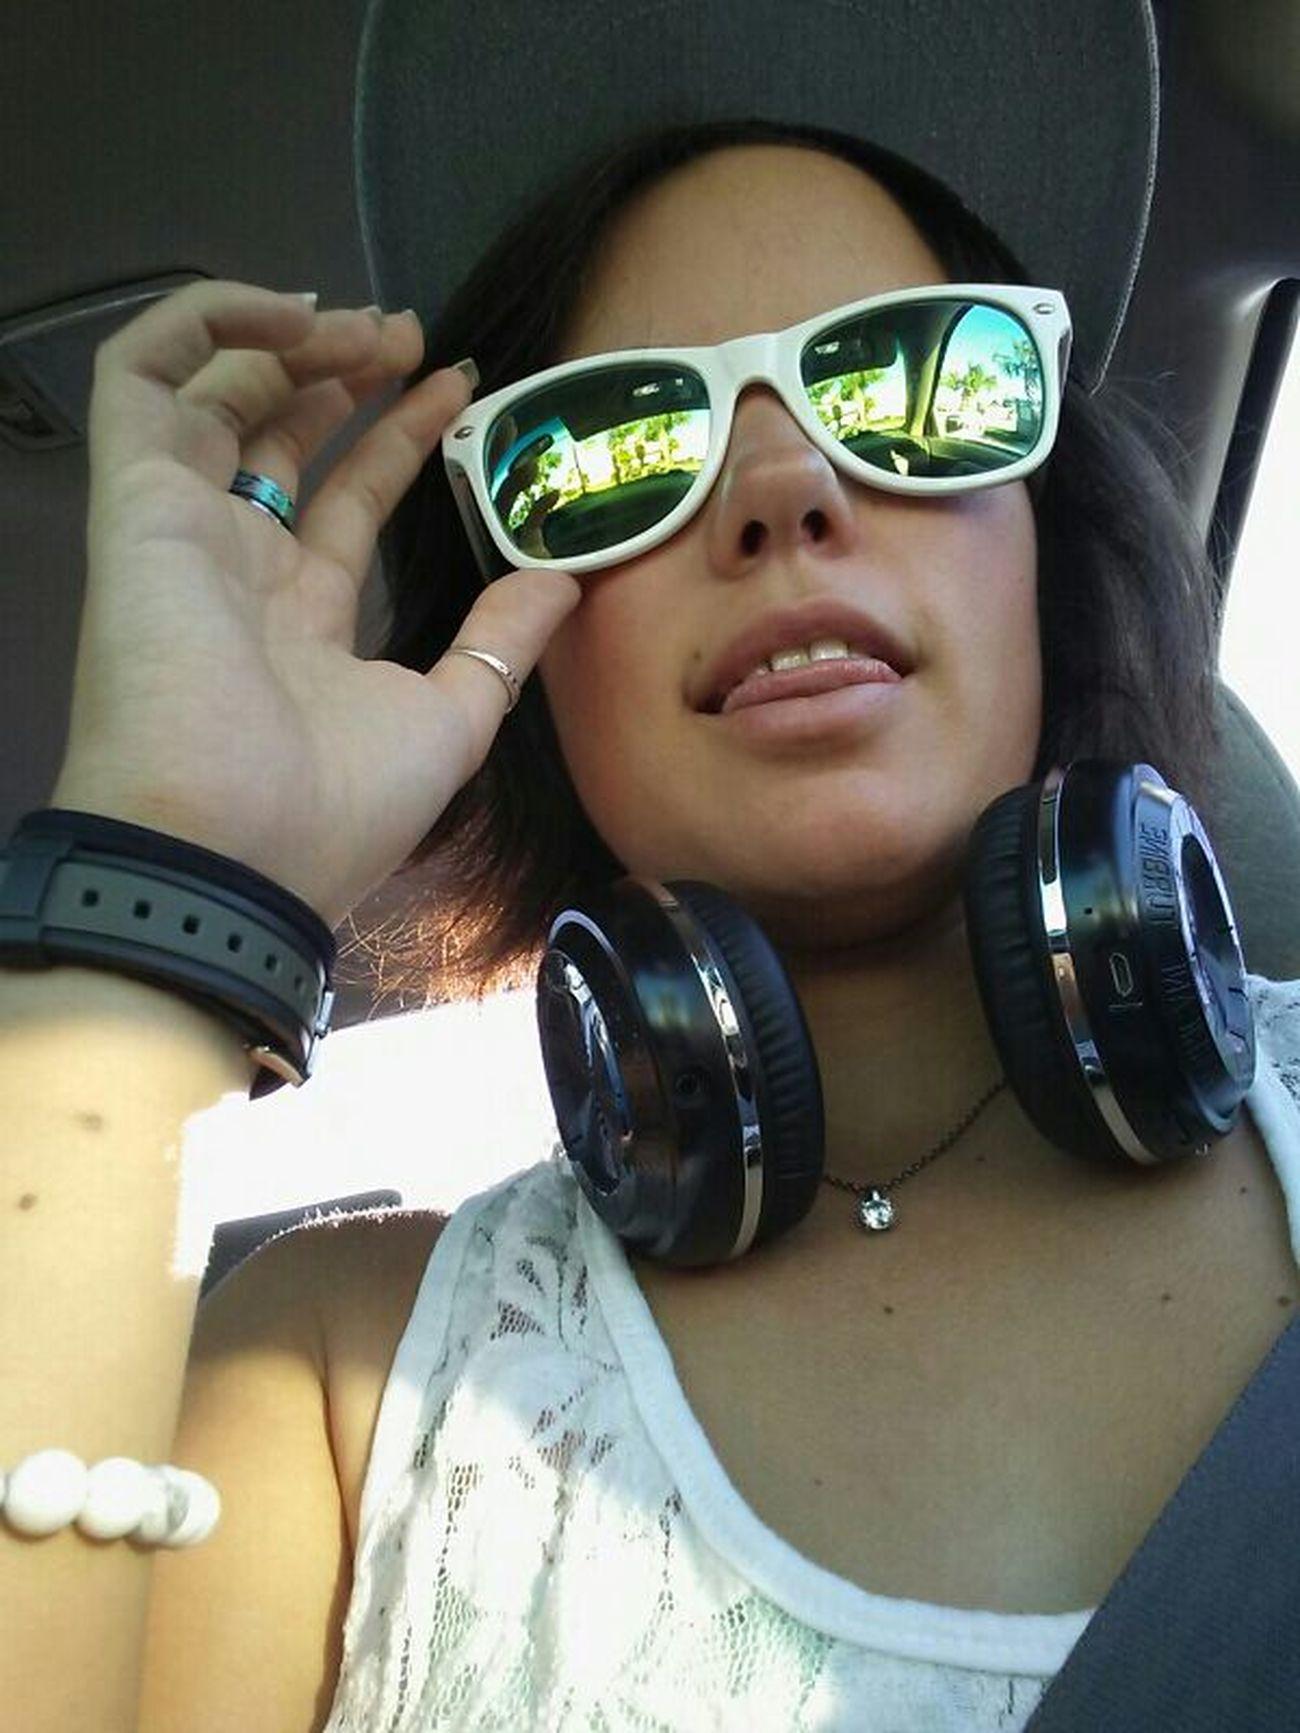 Freckles Headphones Headshot Jewelry Selfie Snapback Sunglasses Tan Watch White